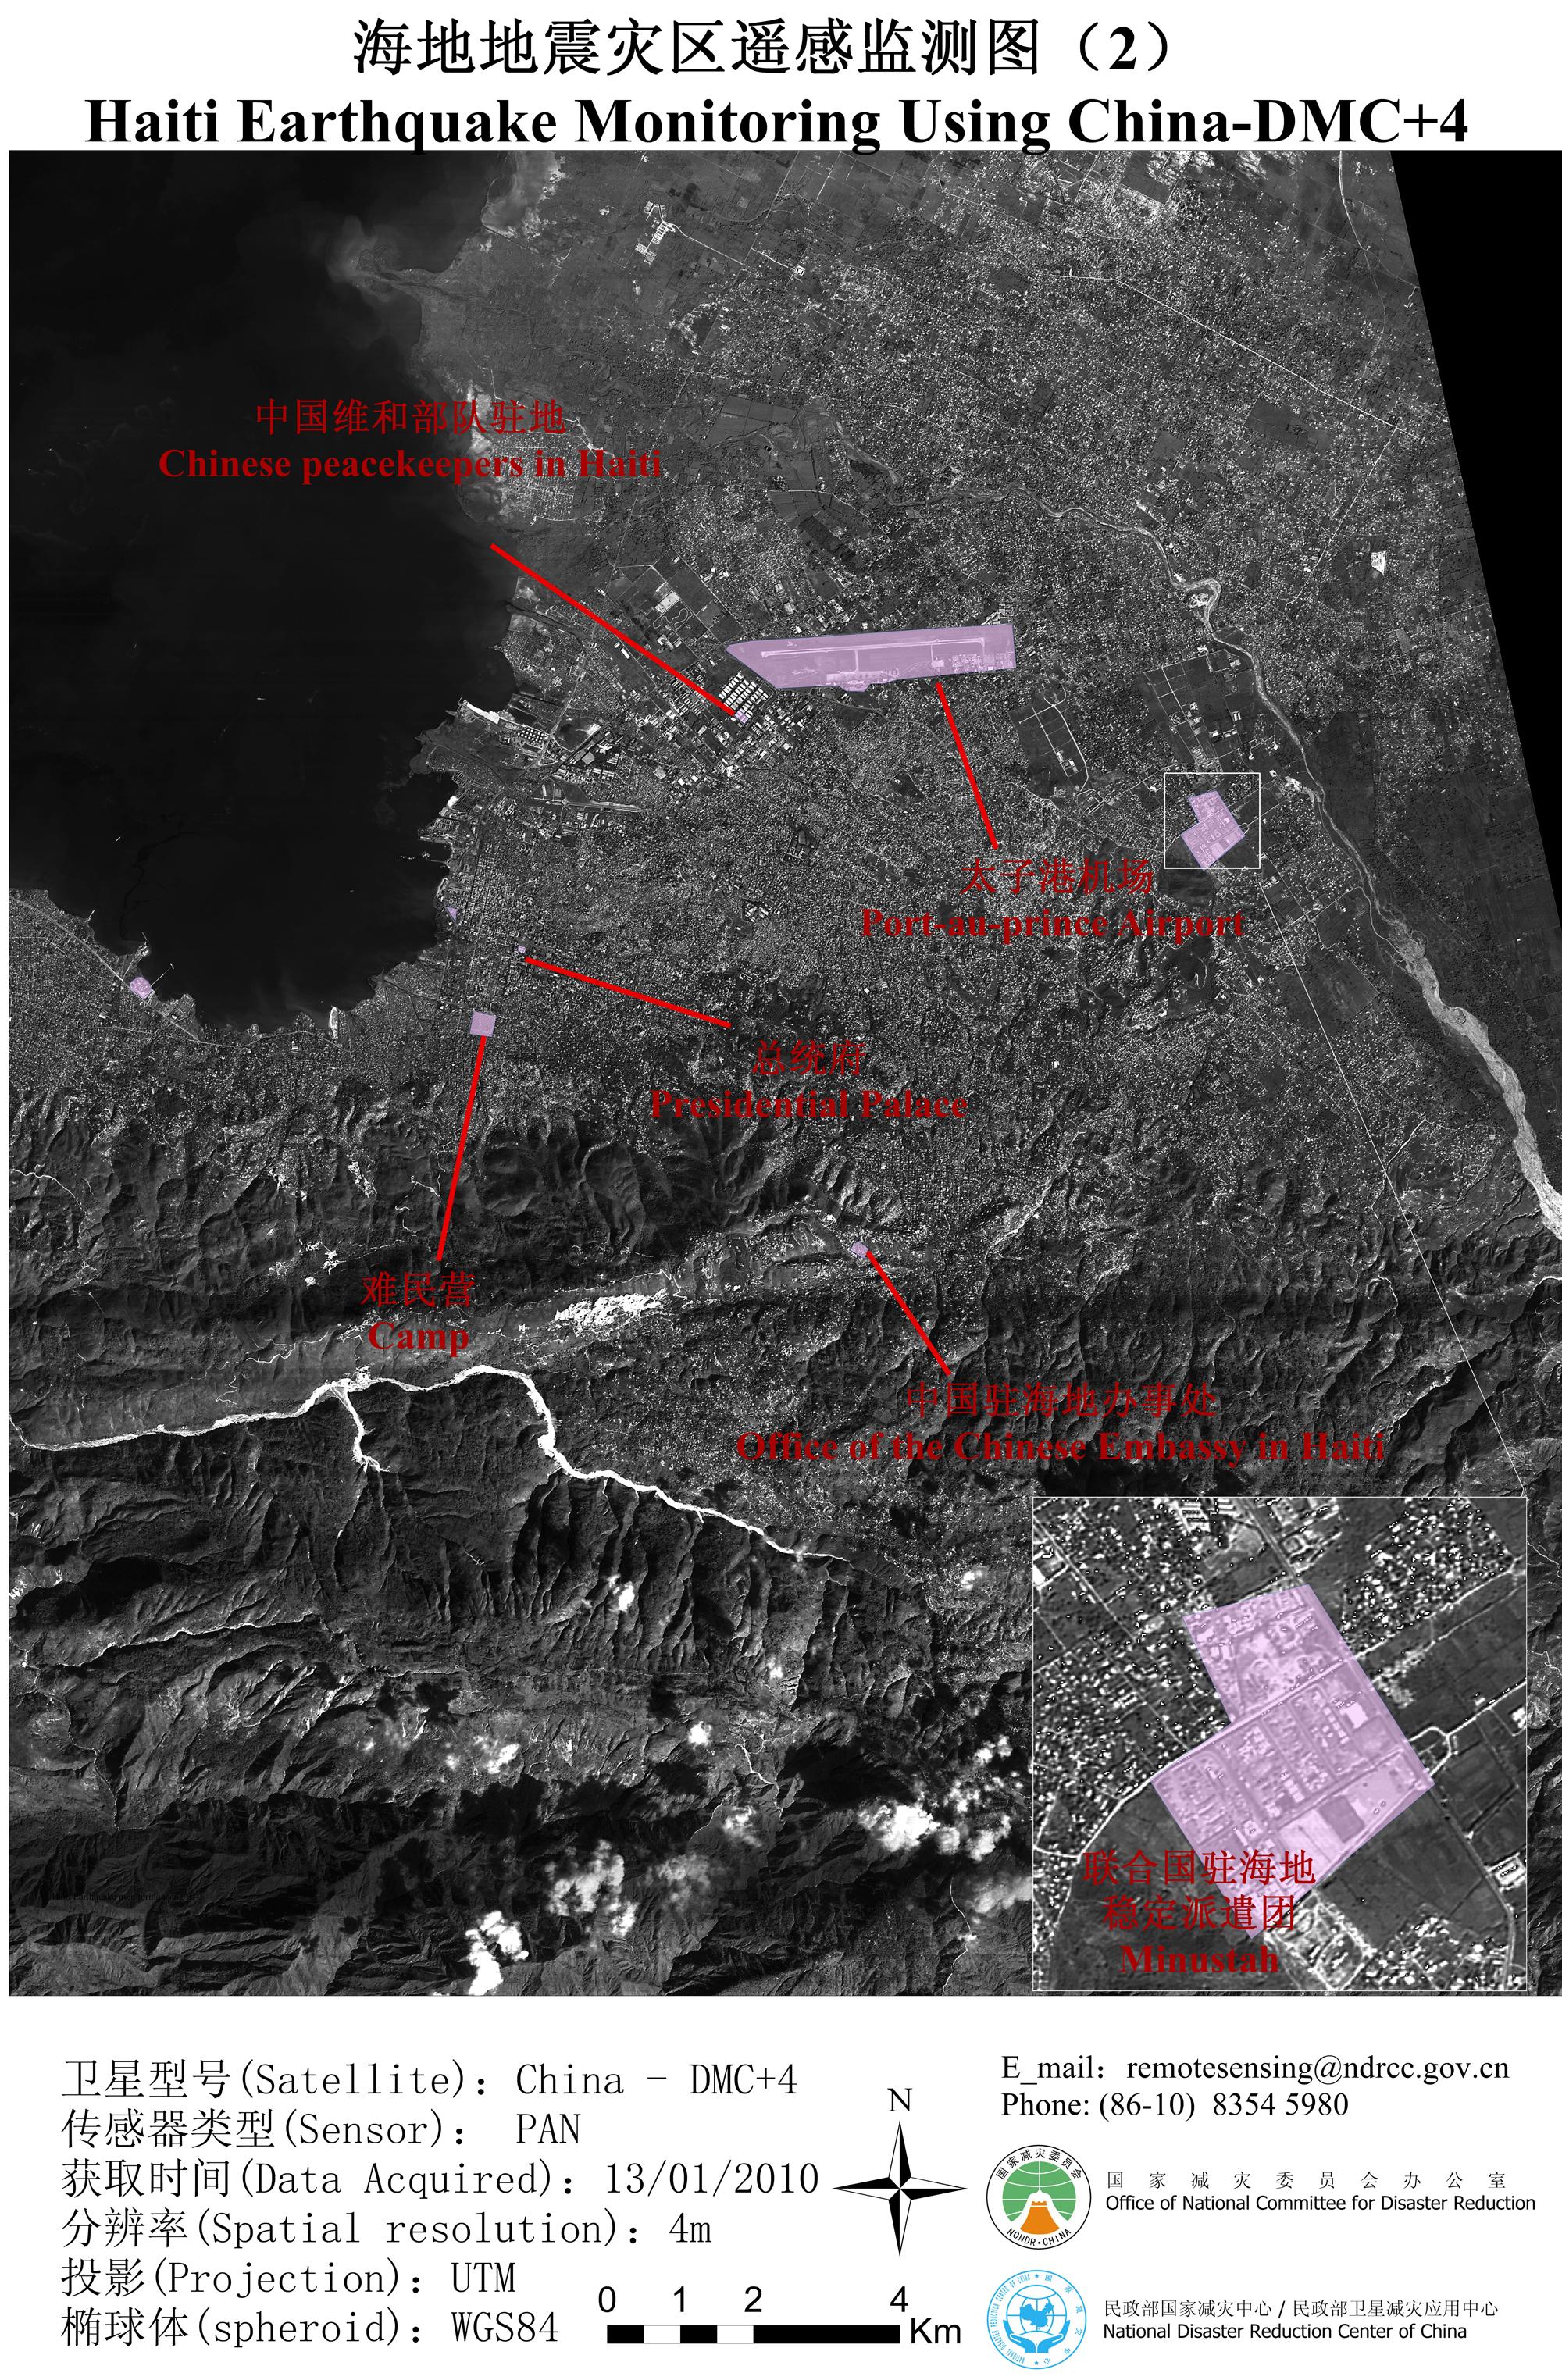 Port-au-Prince's notorious slum, Cite Soleil, is repeatedly described ...